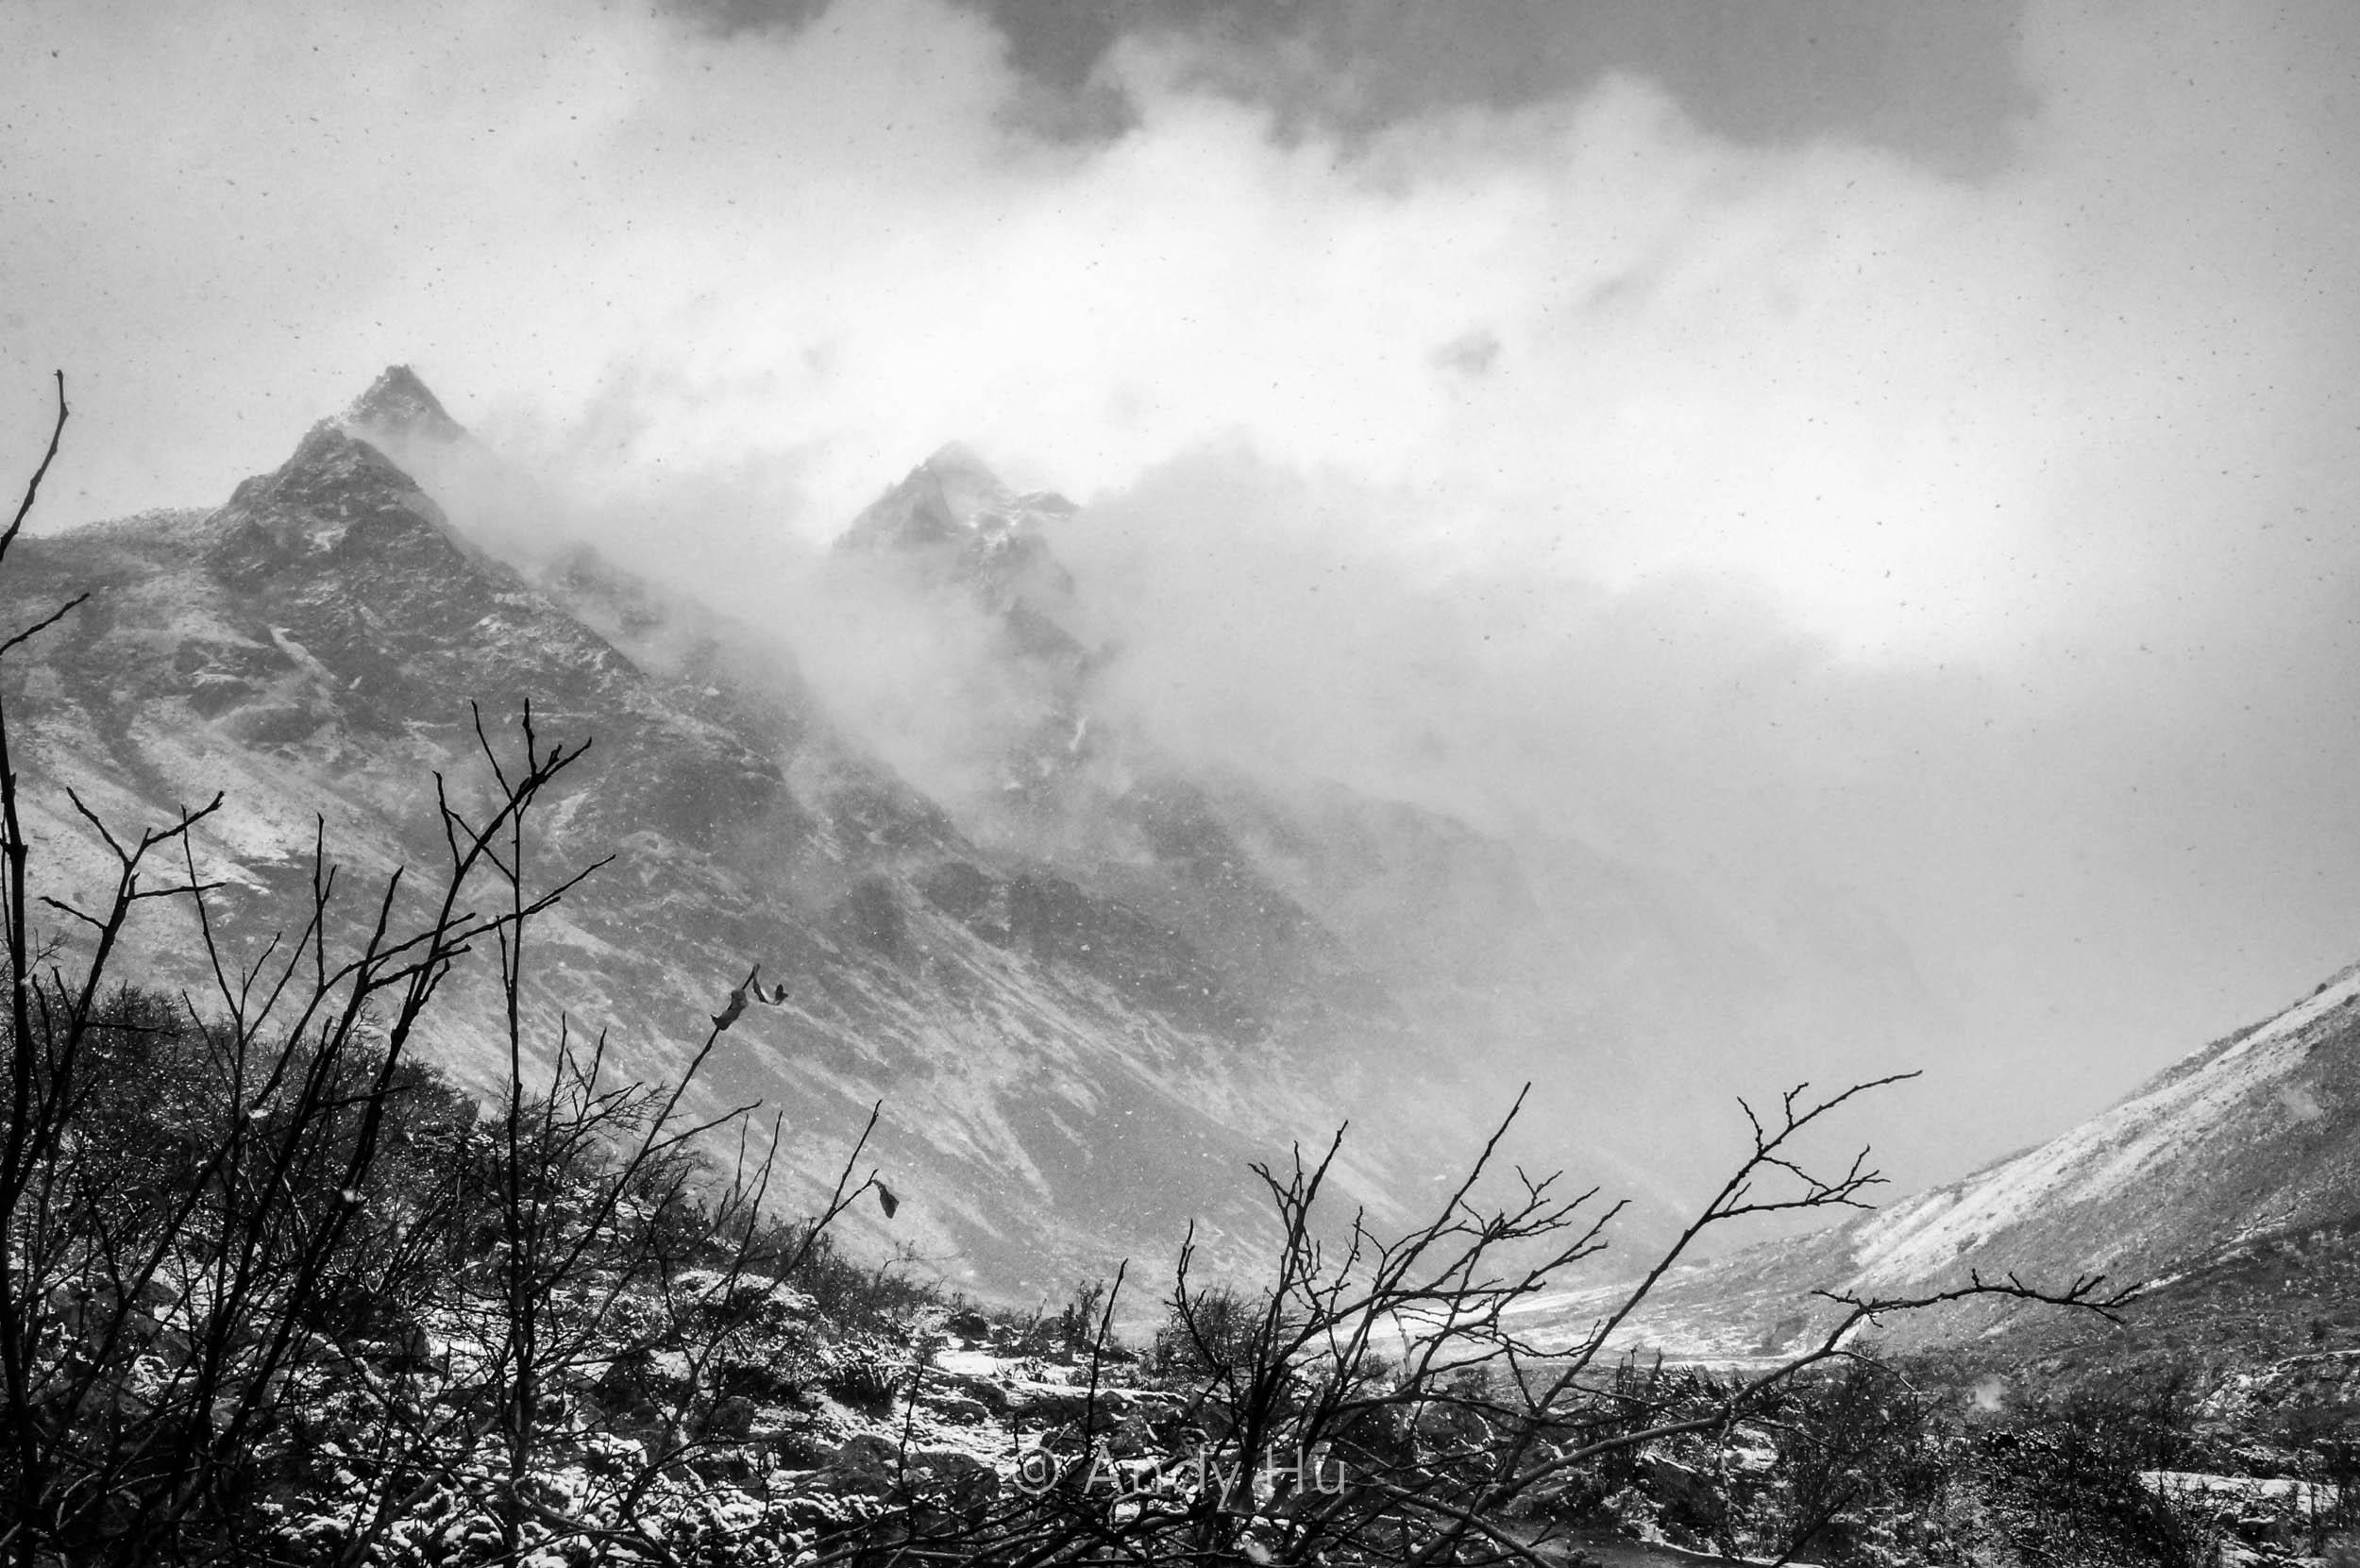 Mountains in clouds, Mt. Gongga Trek